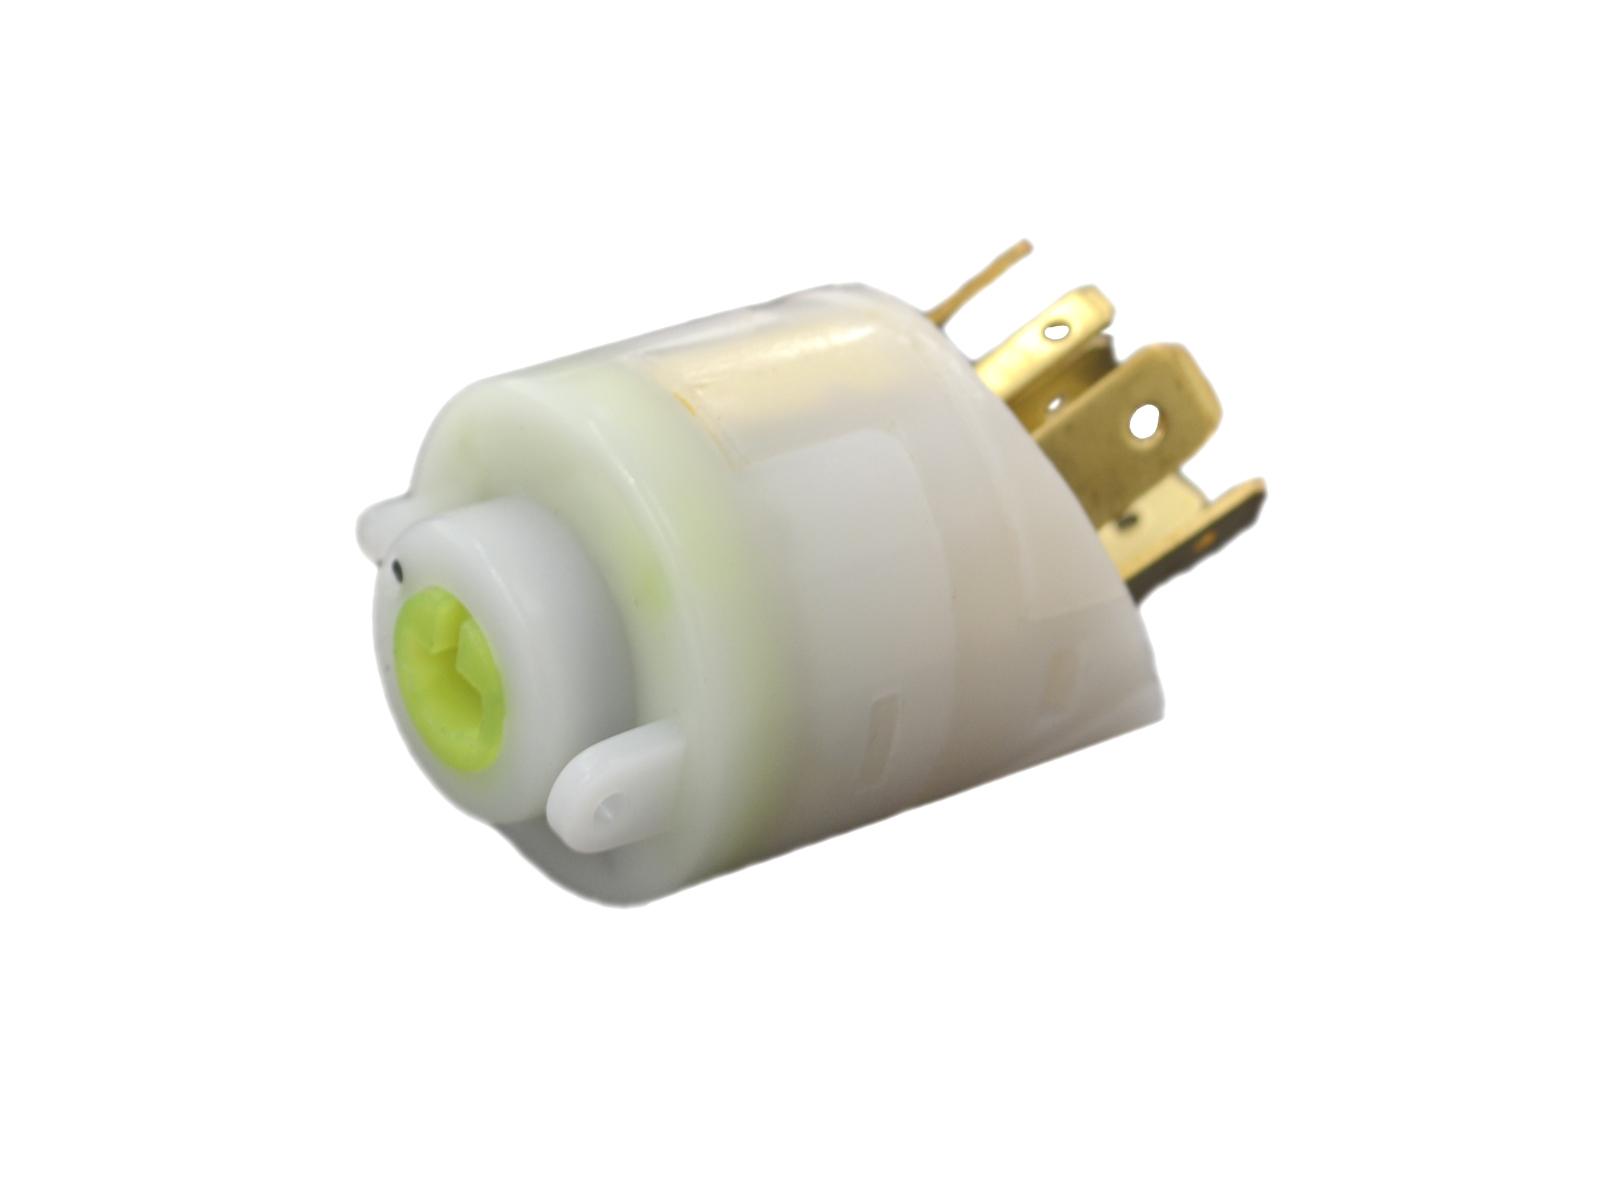 1x ABS-Sensor Raddrehzahlsensor mit orig Infineon-Chip Mazda 323 F//S VA links